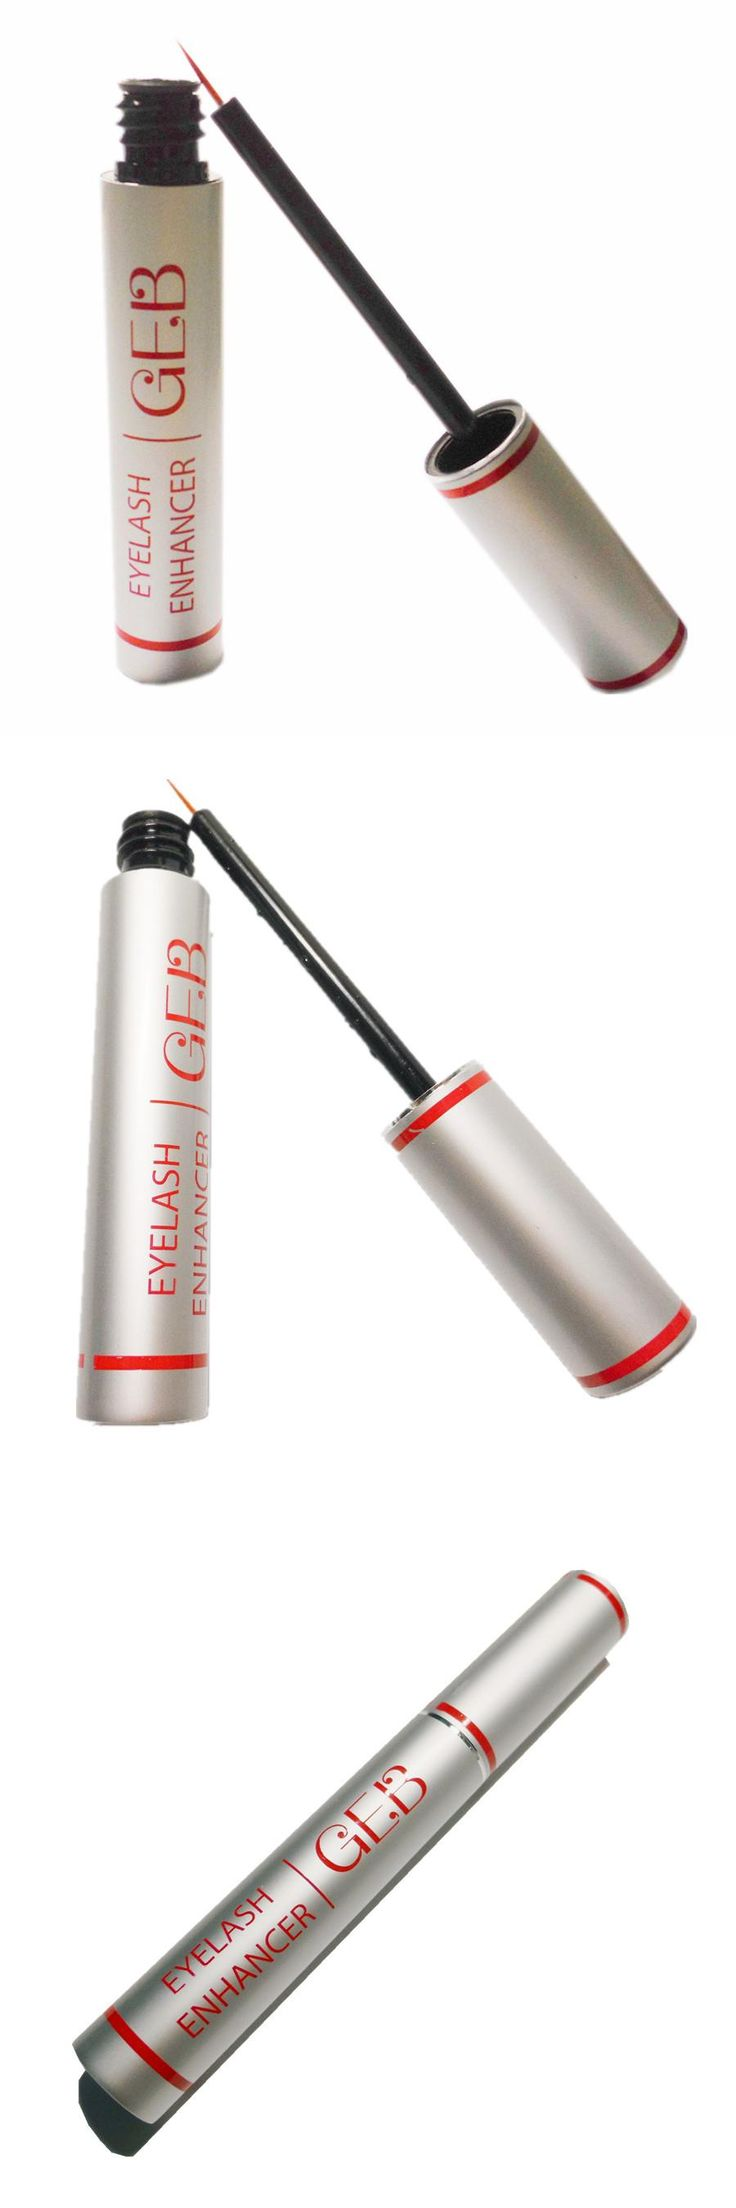 [Visit to Buy] GEB eyelash enhancer for eyelash growth treatment 3ml eyelash growth liquid Upgrade FEG (Clearance sell) #Advertisement